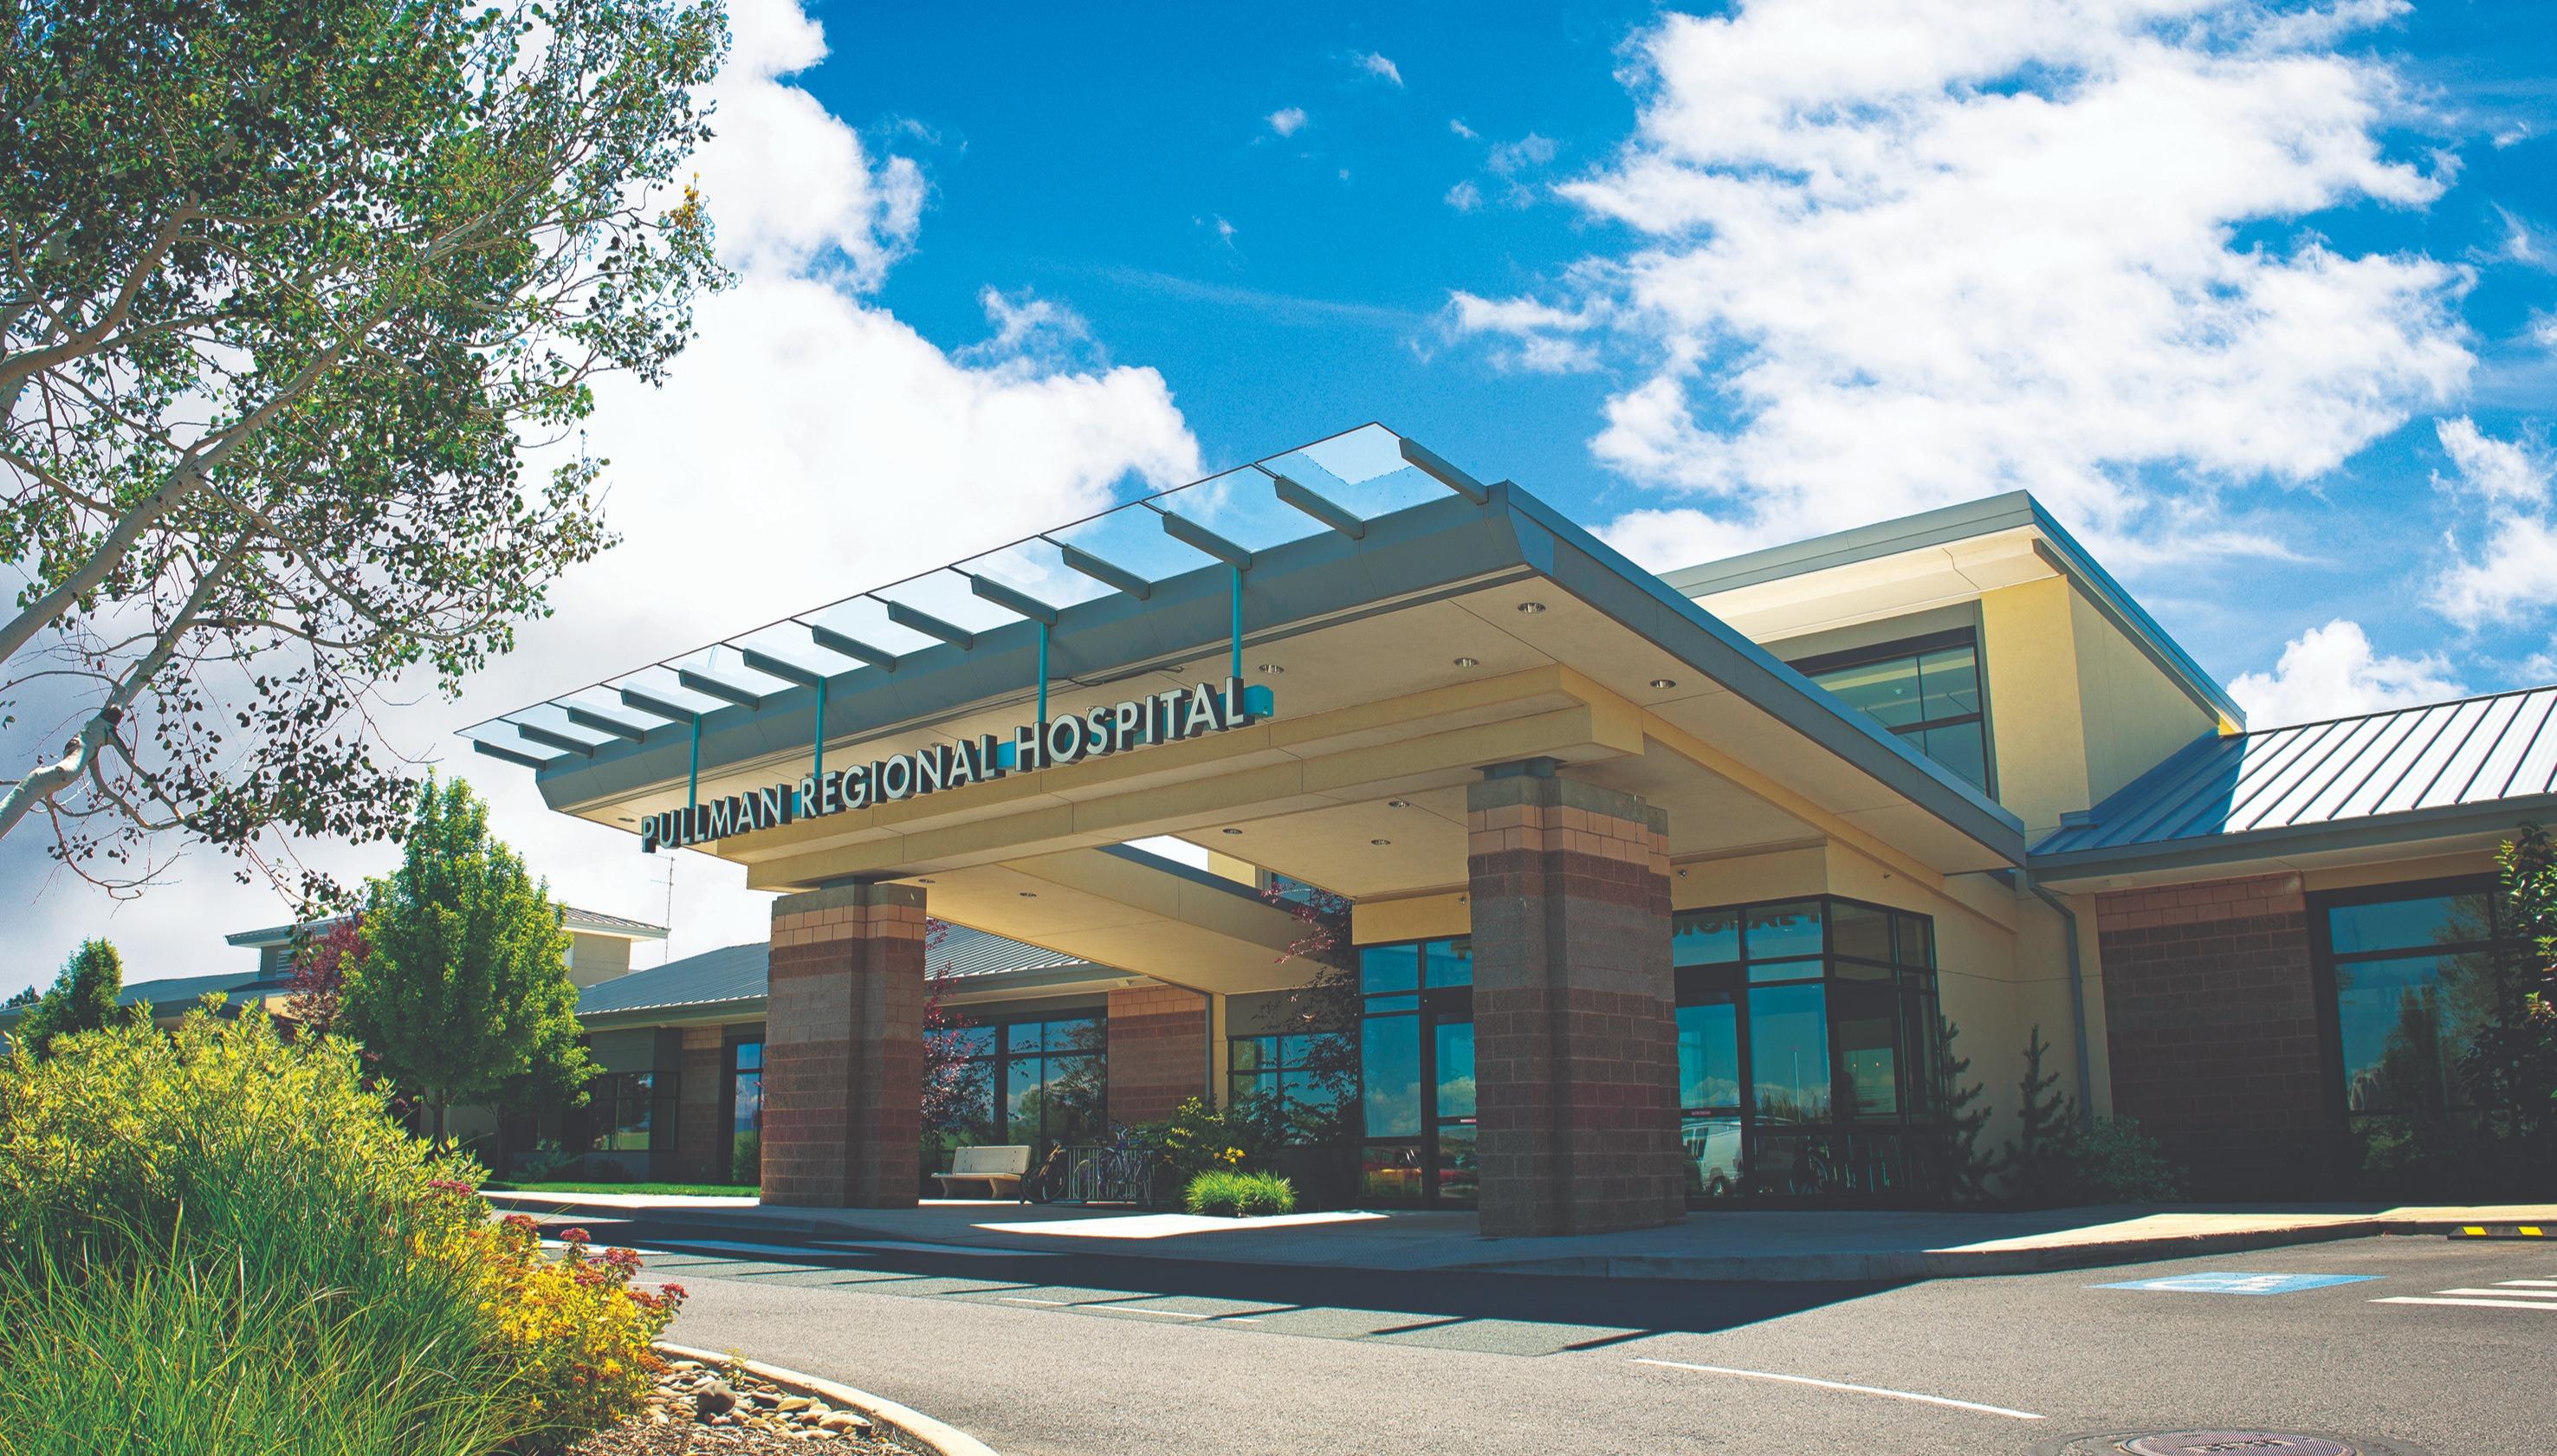 Pullman Regional Hospital Board Initiates CEO Succession Plan